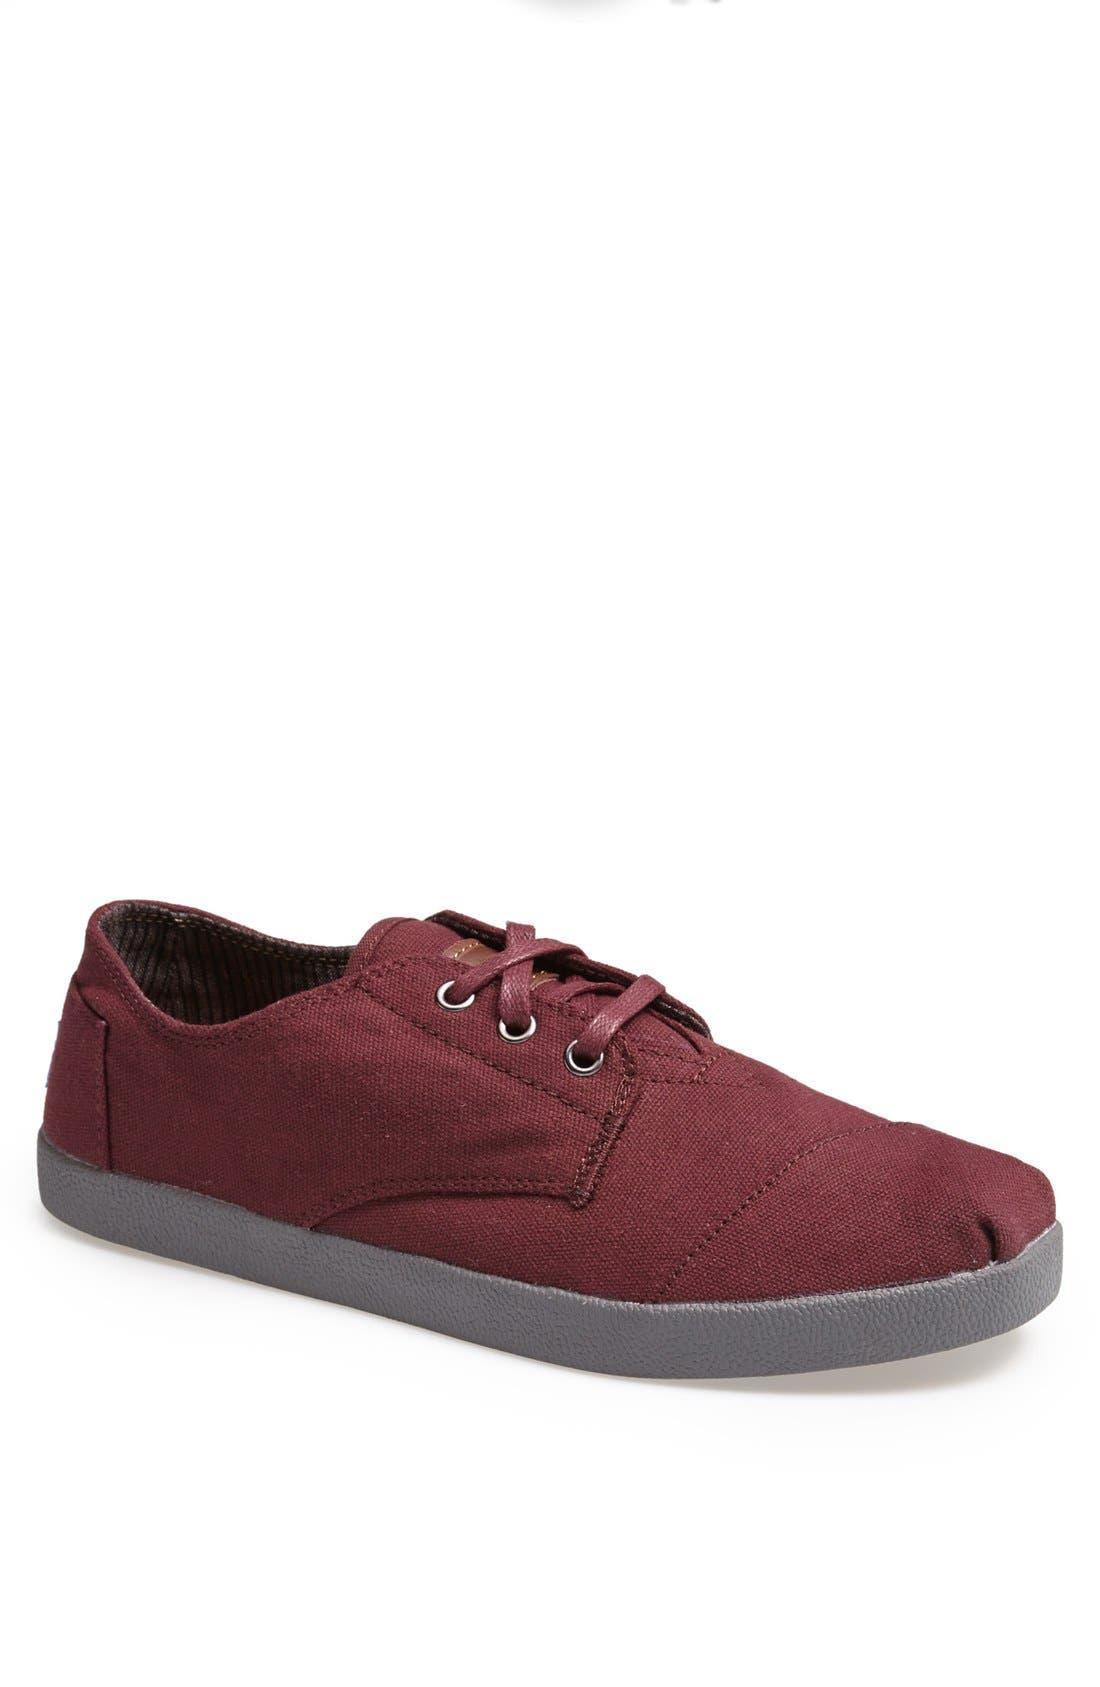 Alternate Image 1 Selected - TOMS 'Paseos' Sneaker (Men)